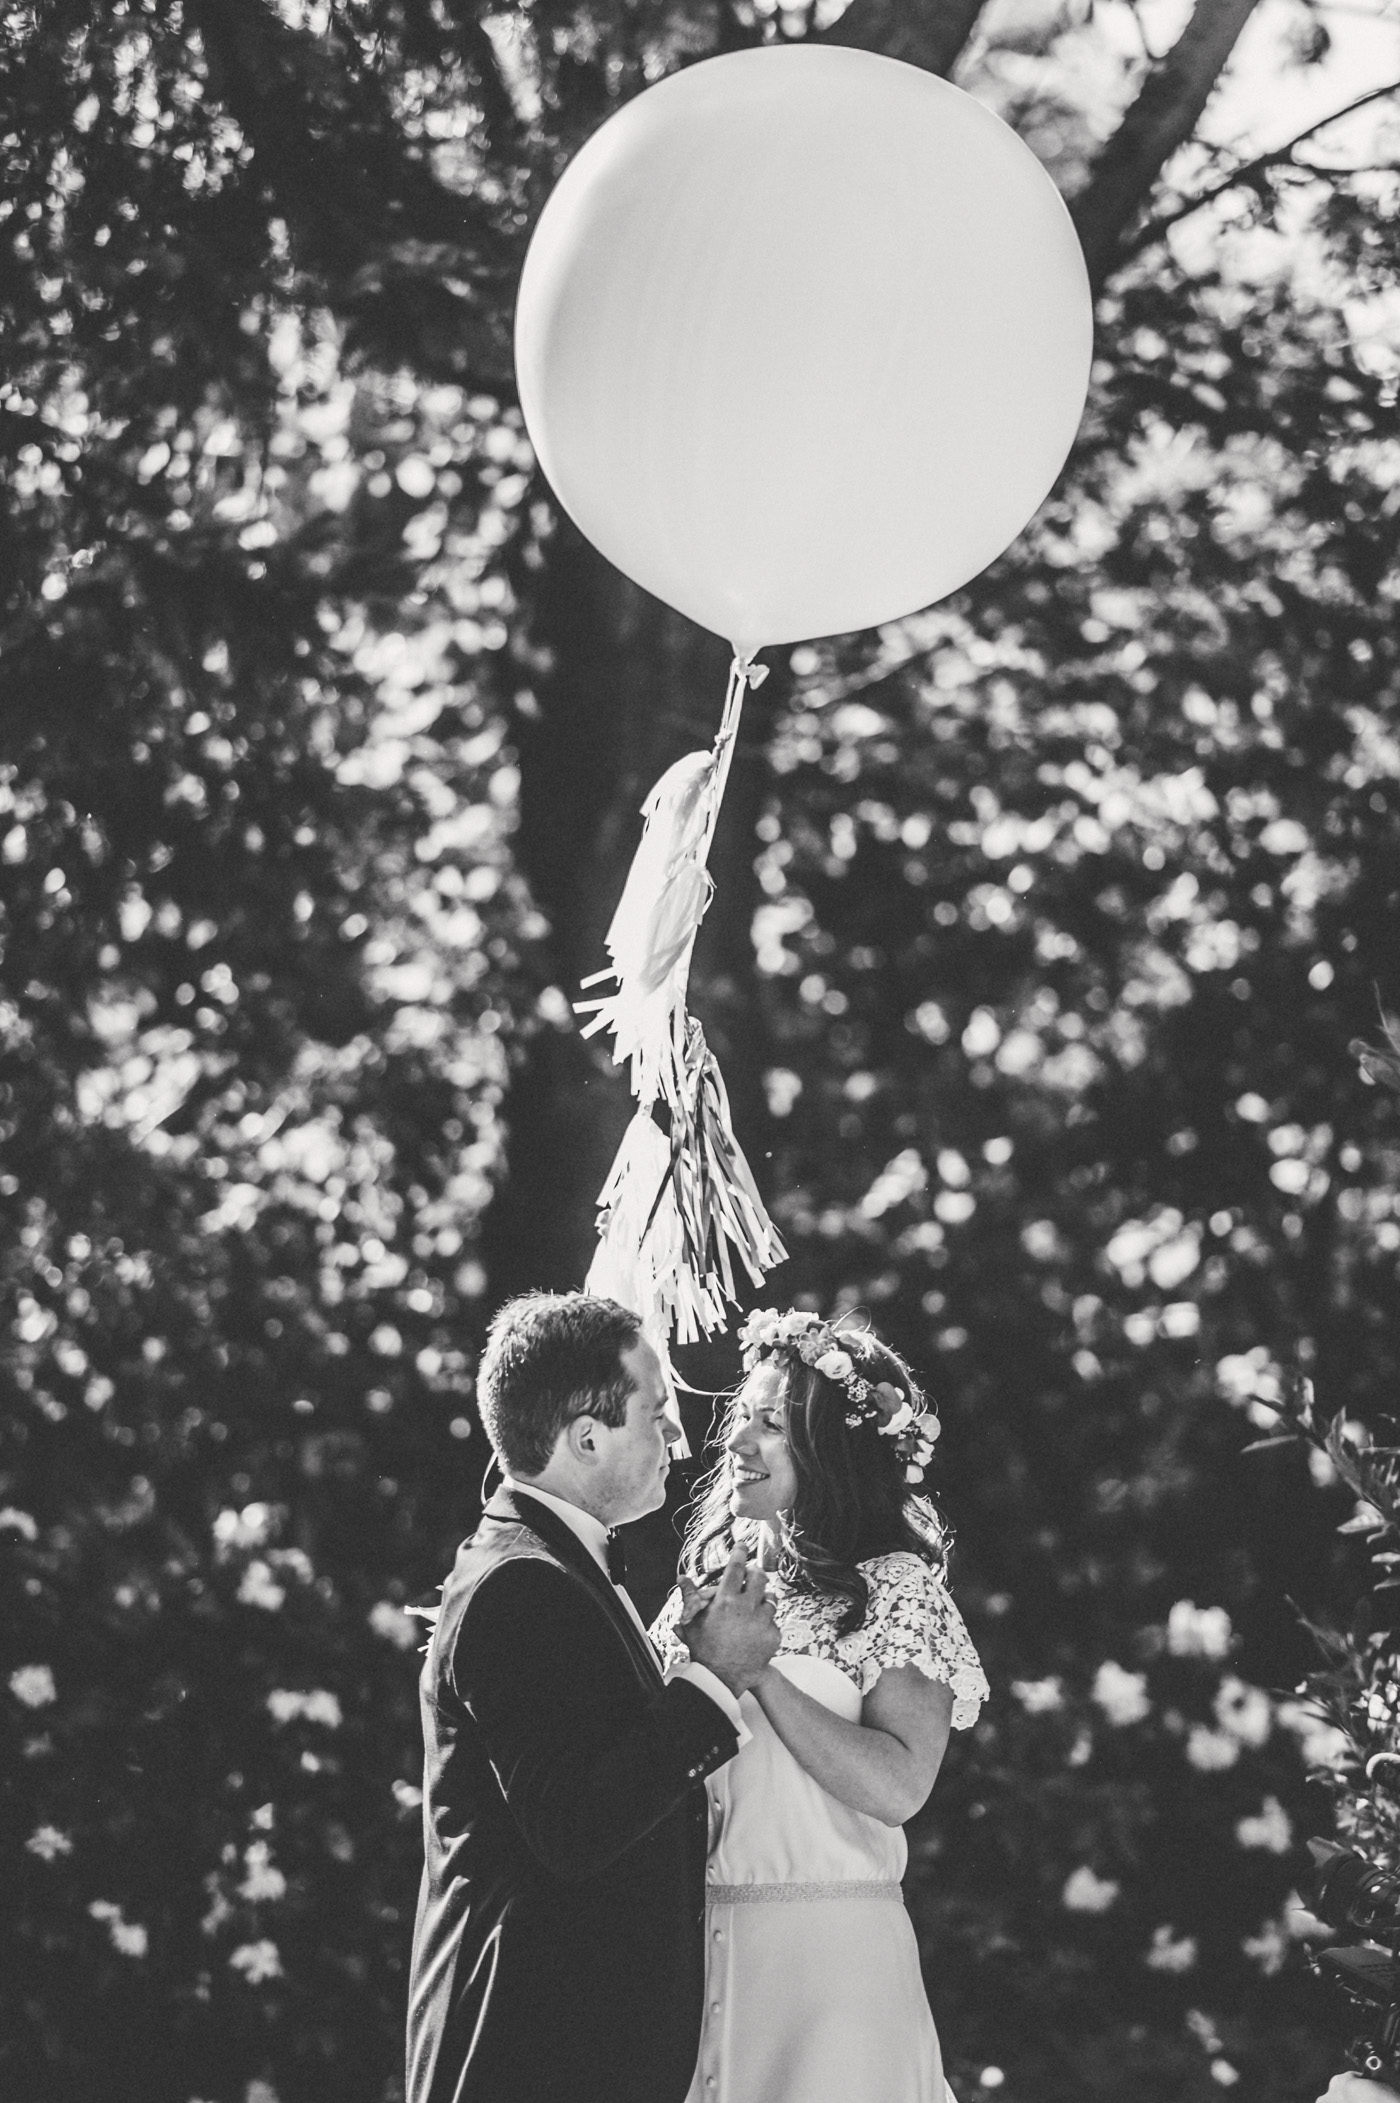 diy-wedding-nothenhof-hoch-4